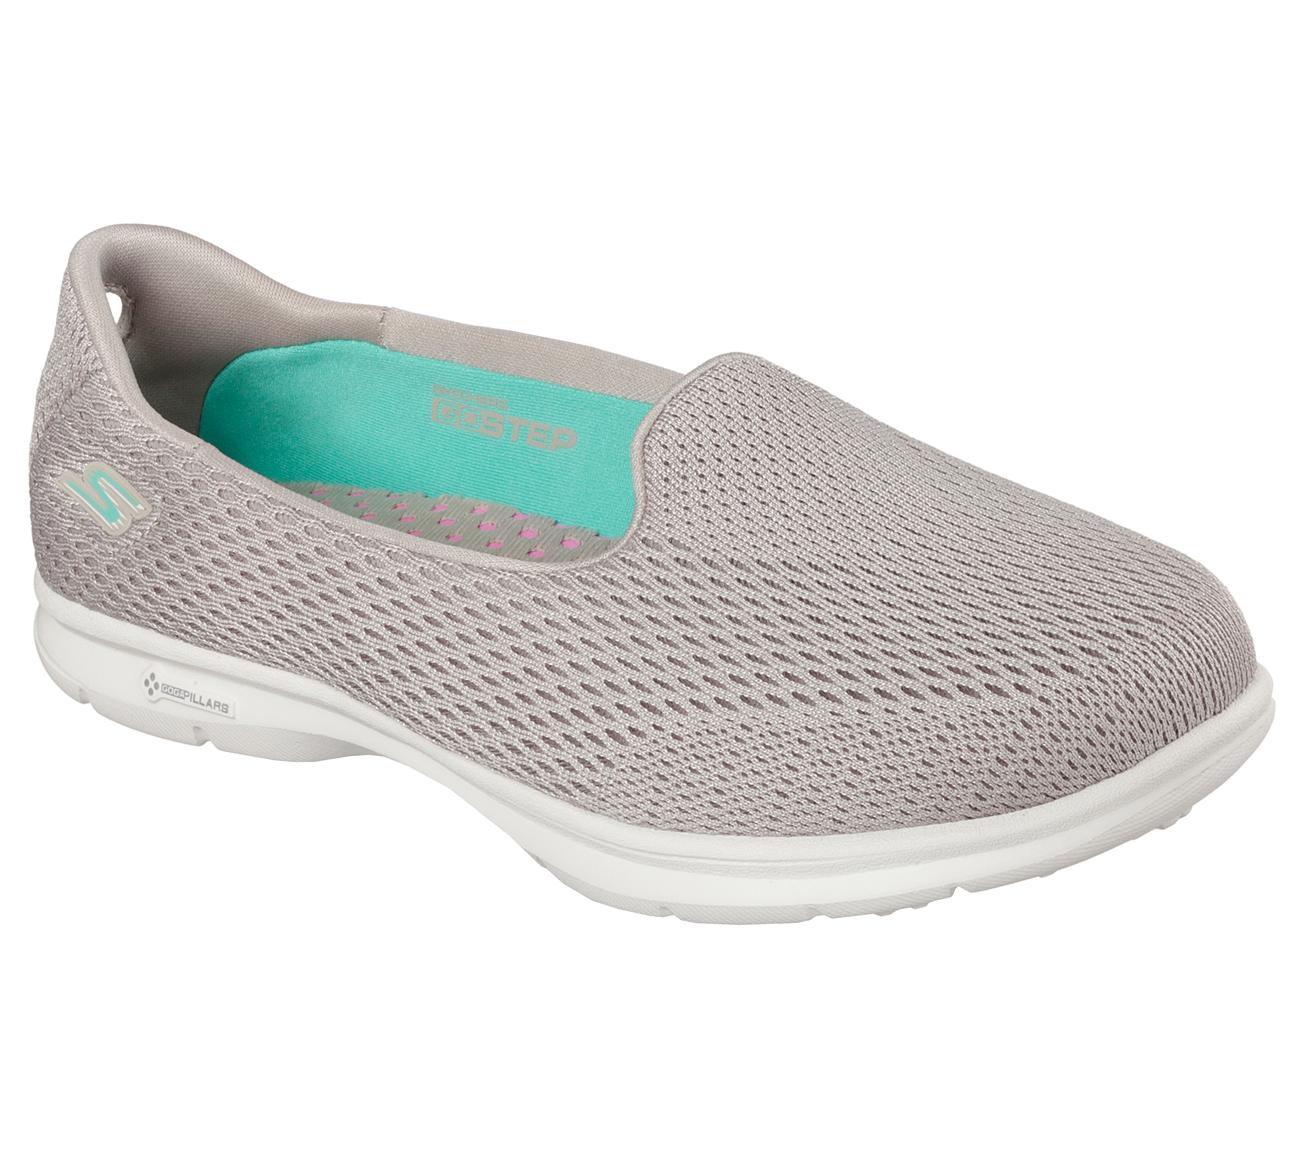 Buy Skechers Skechers Go Step Shift Go Step Shoes Only